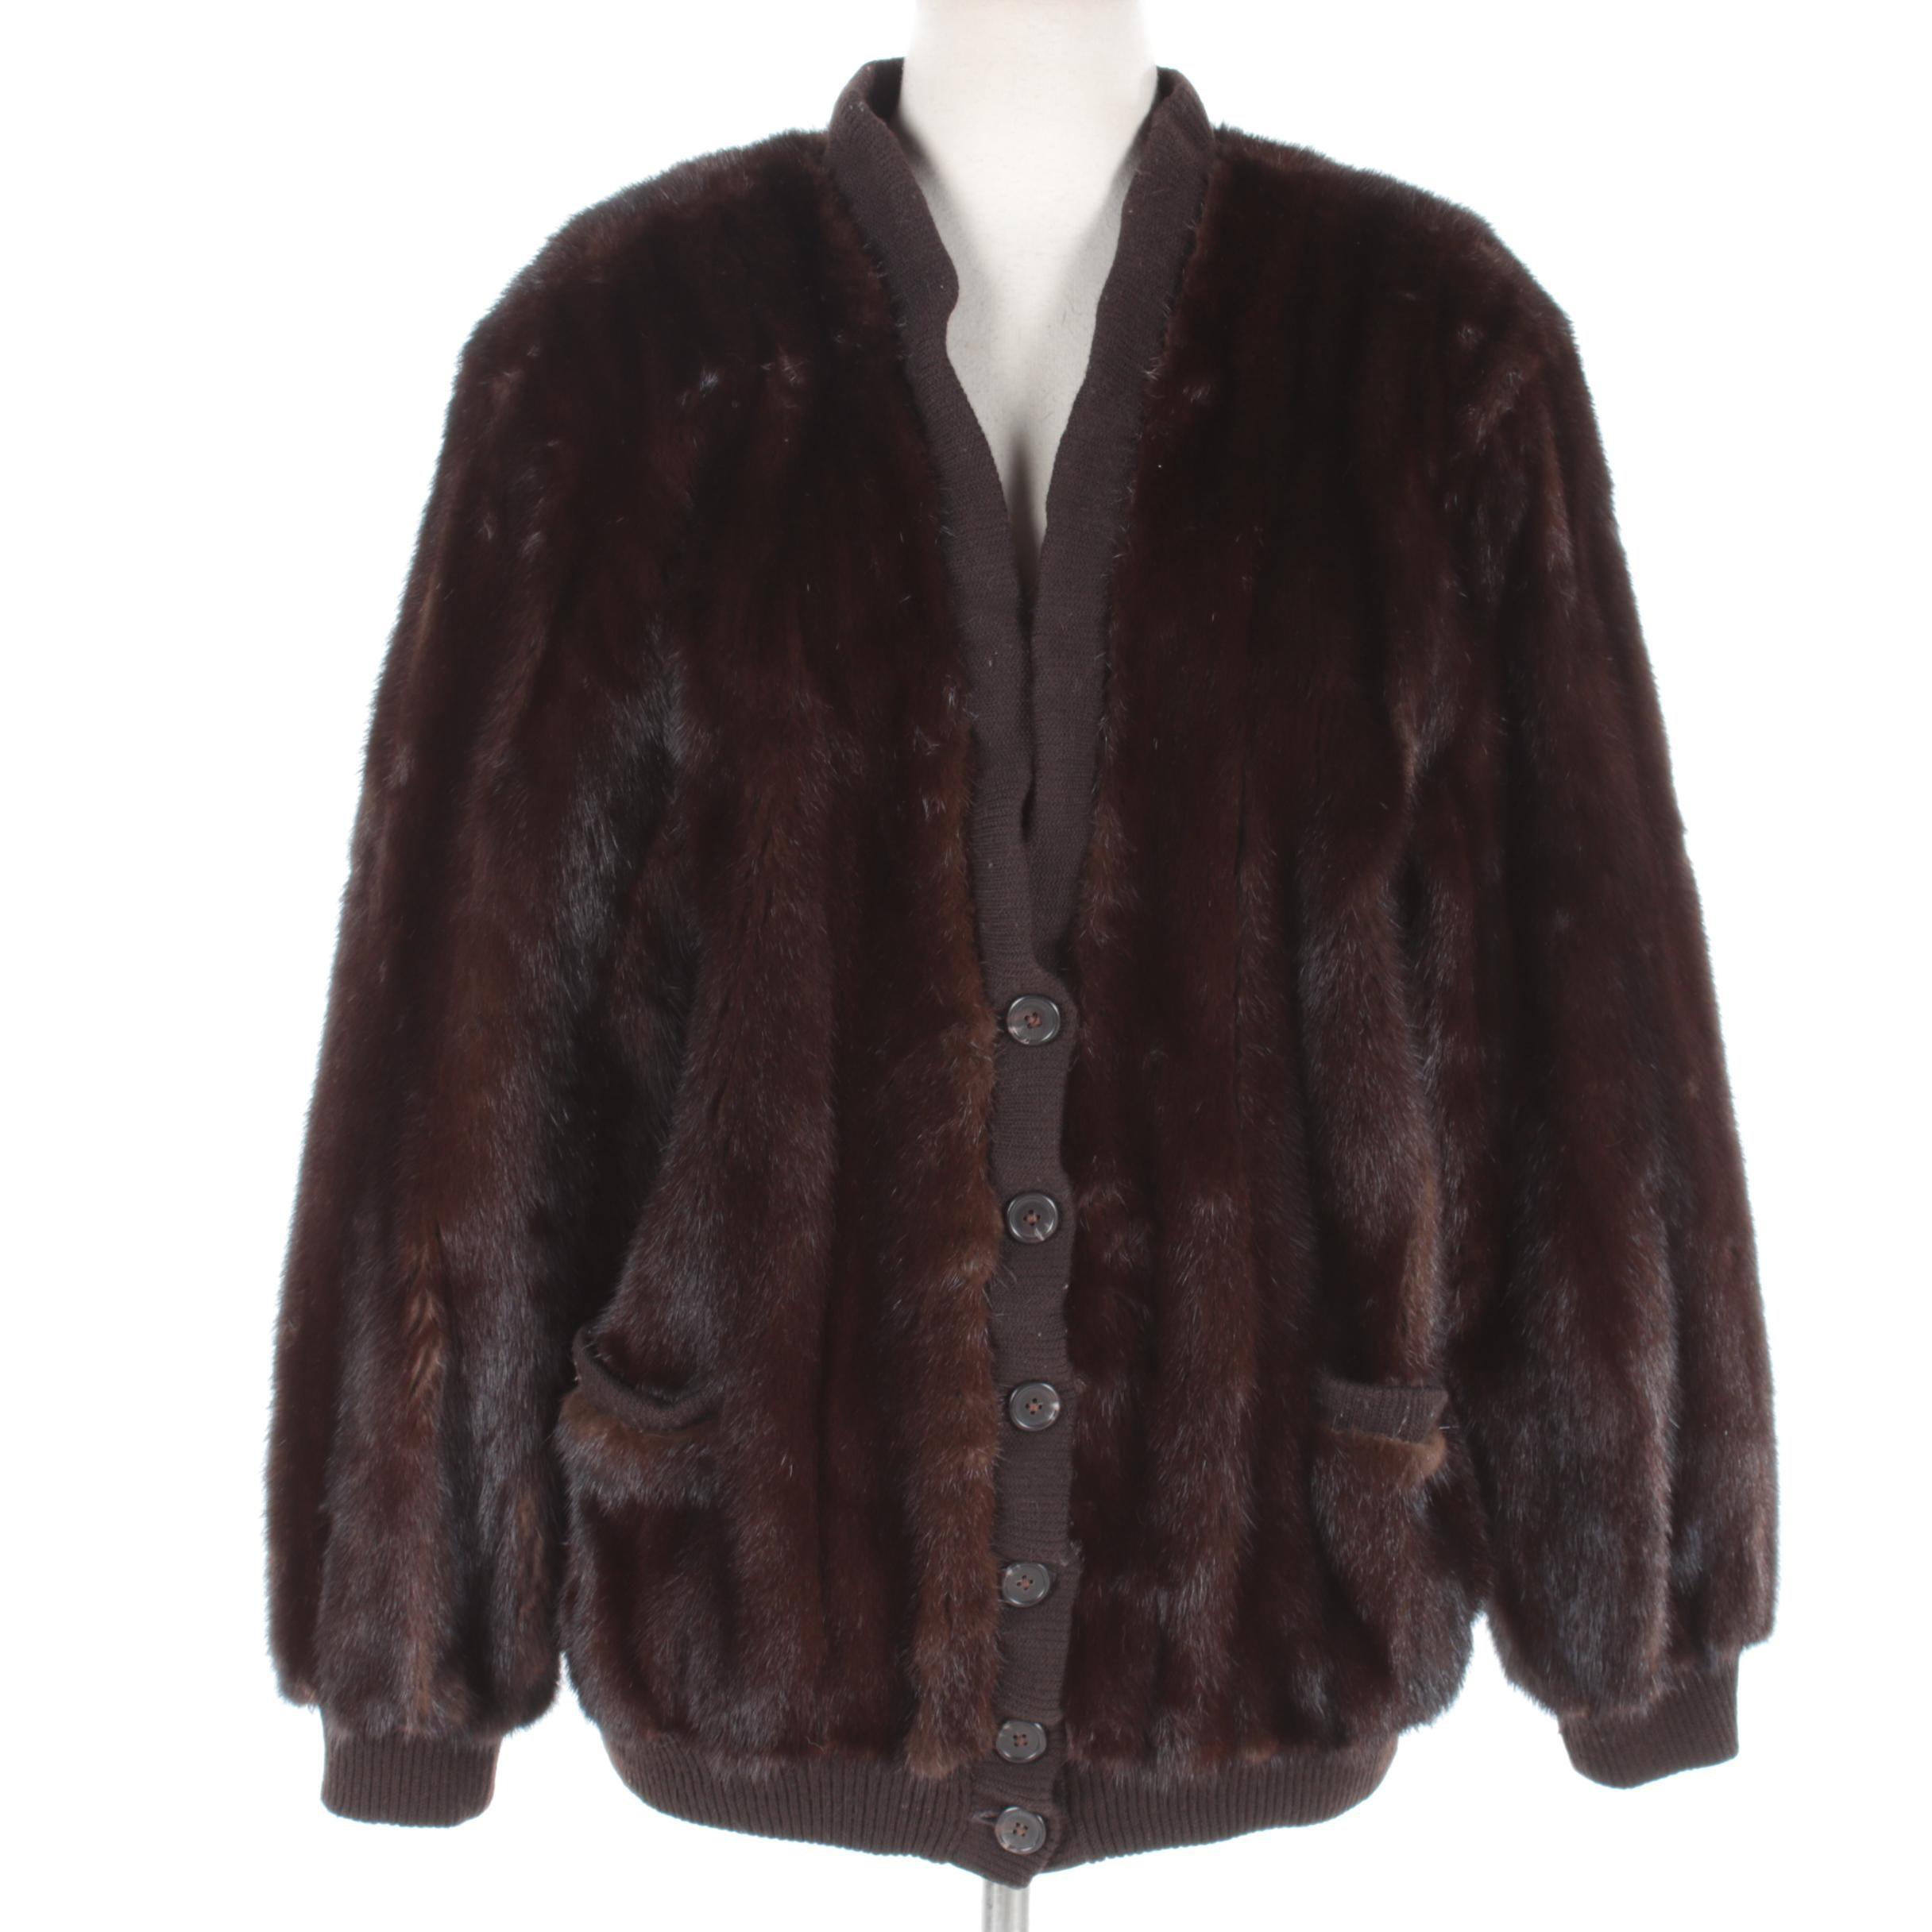 Birger Christensen Mink Fur and Knit Button Front Jacket